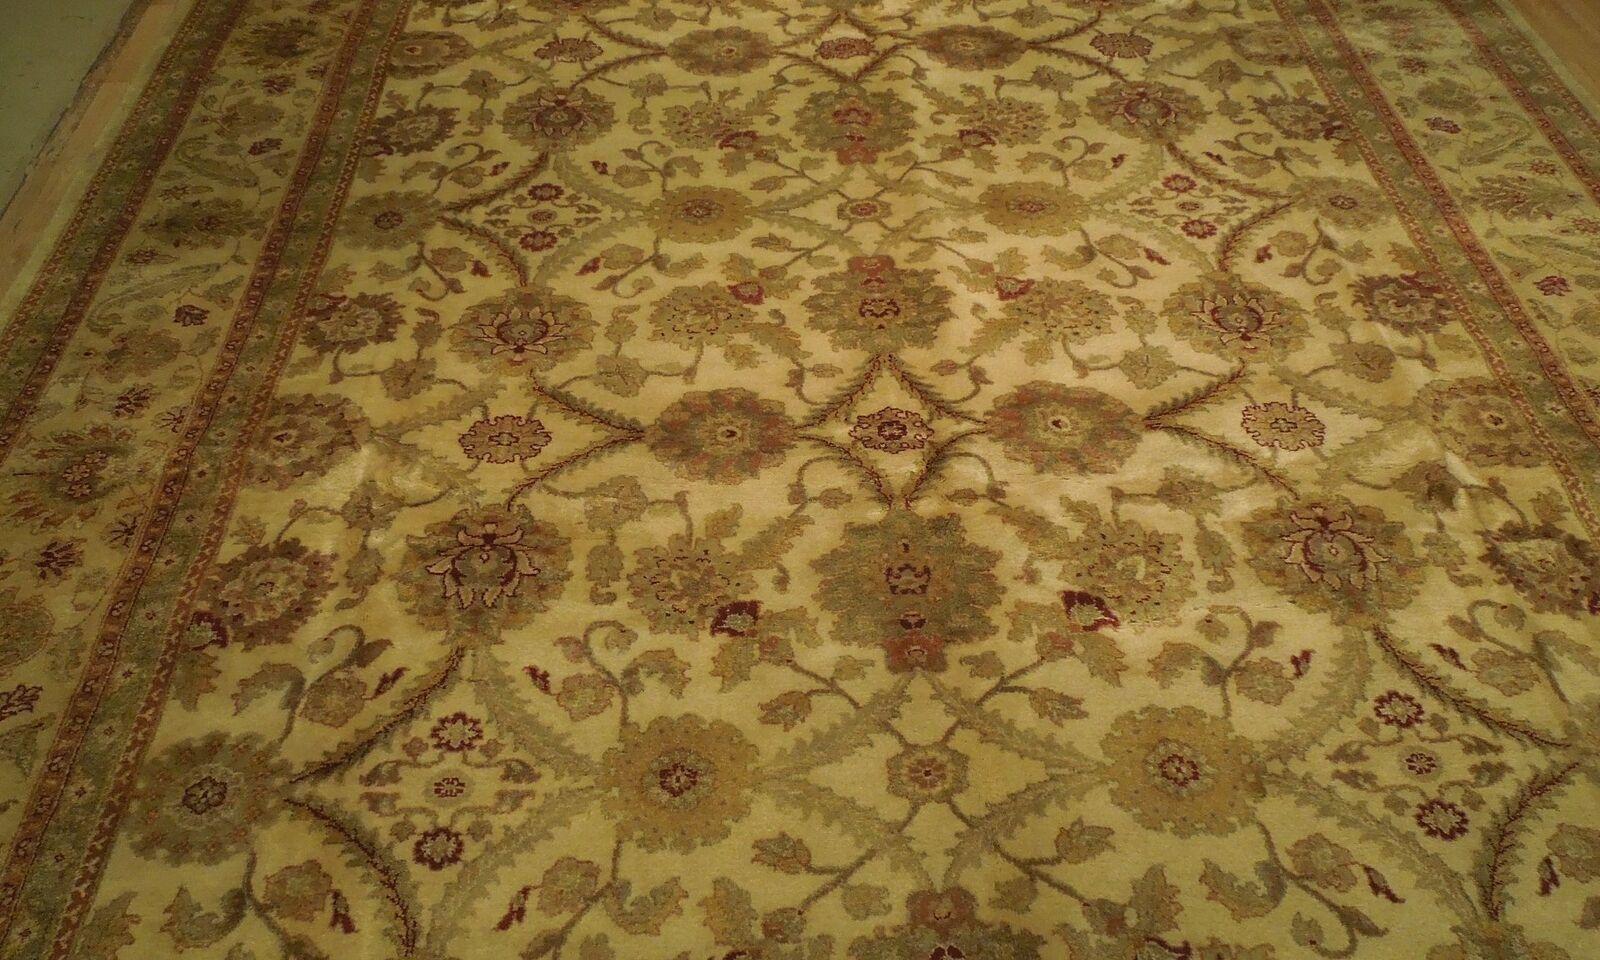 New Smooth Wool Authentic Handmade 10' x 14' Beige Jaipur Wool Rug image 10